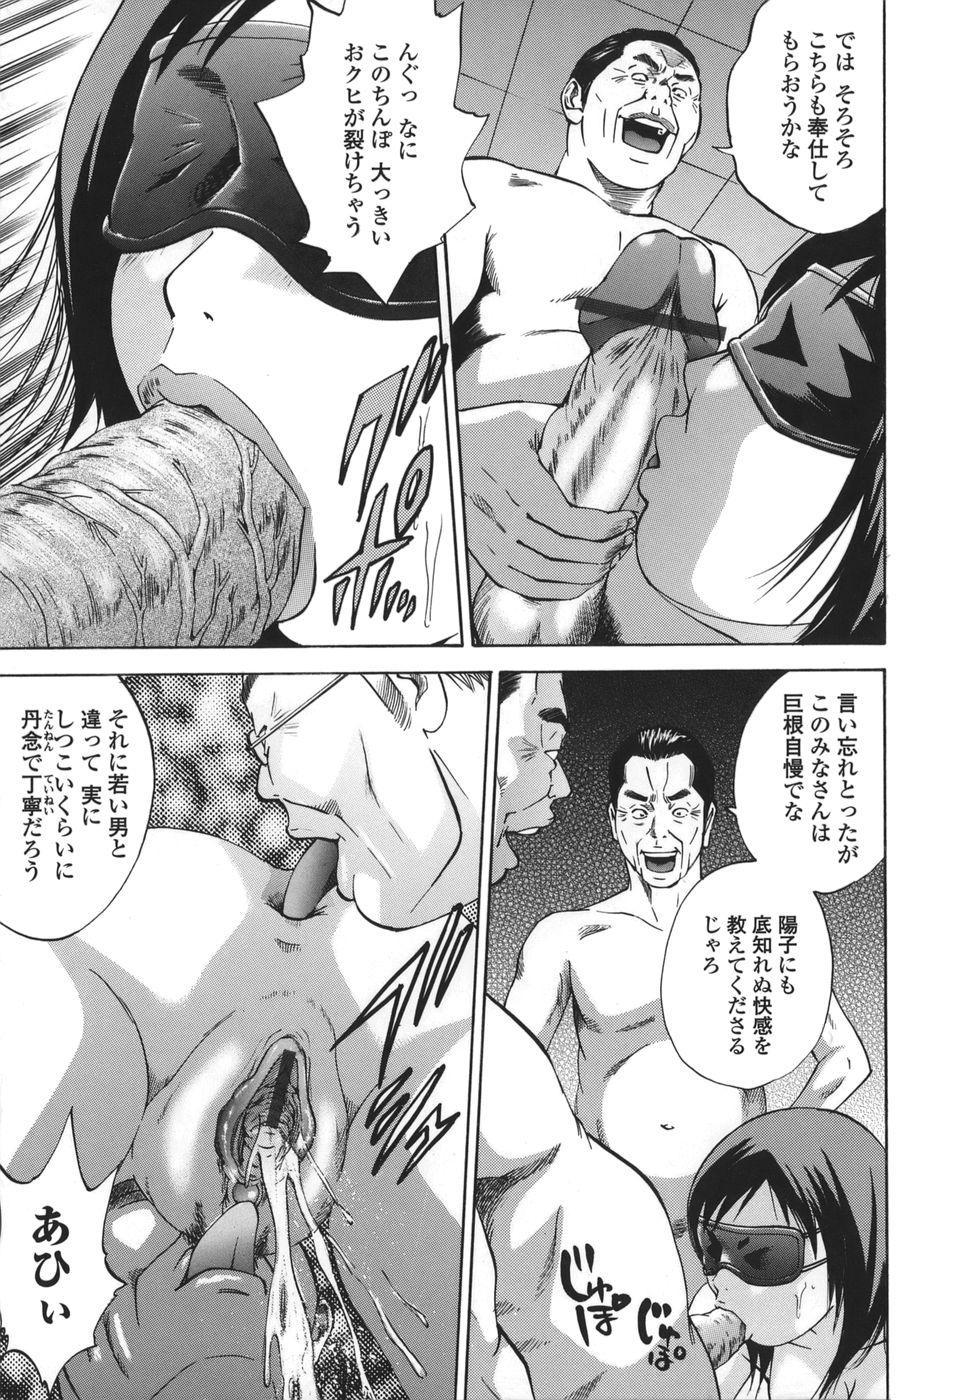 Kinshin Goukan - Near Relation Rapes 60